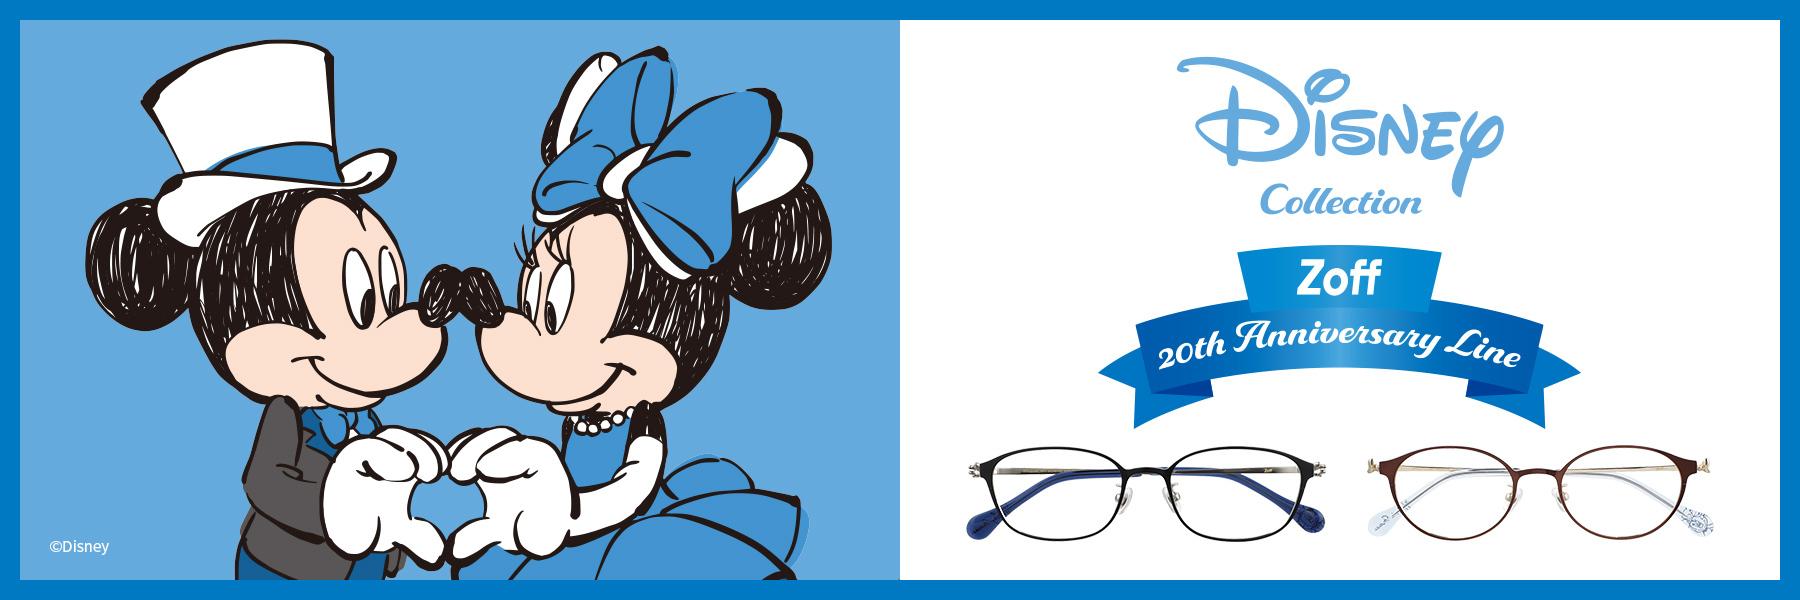 「Zoff×ディズニー」ミッキー&ミニーモチーフのシックなメガネ発売!目元から秋の装いに